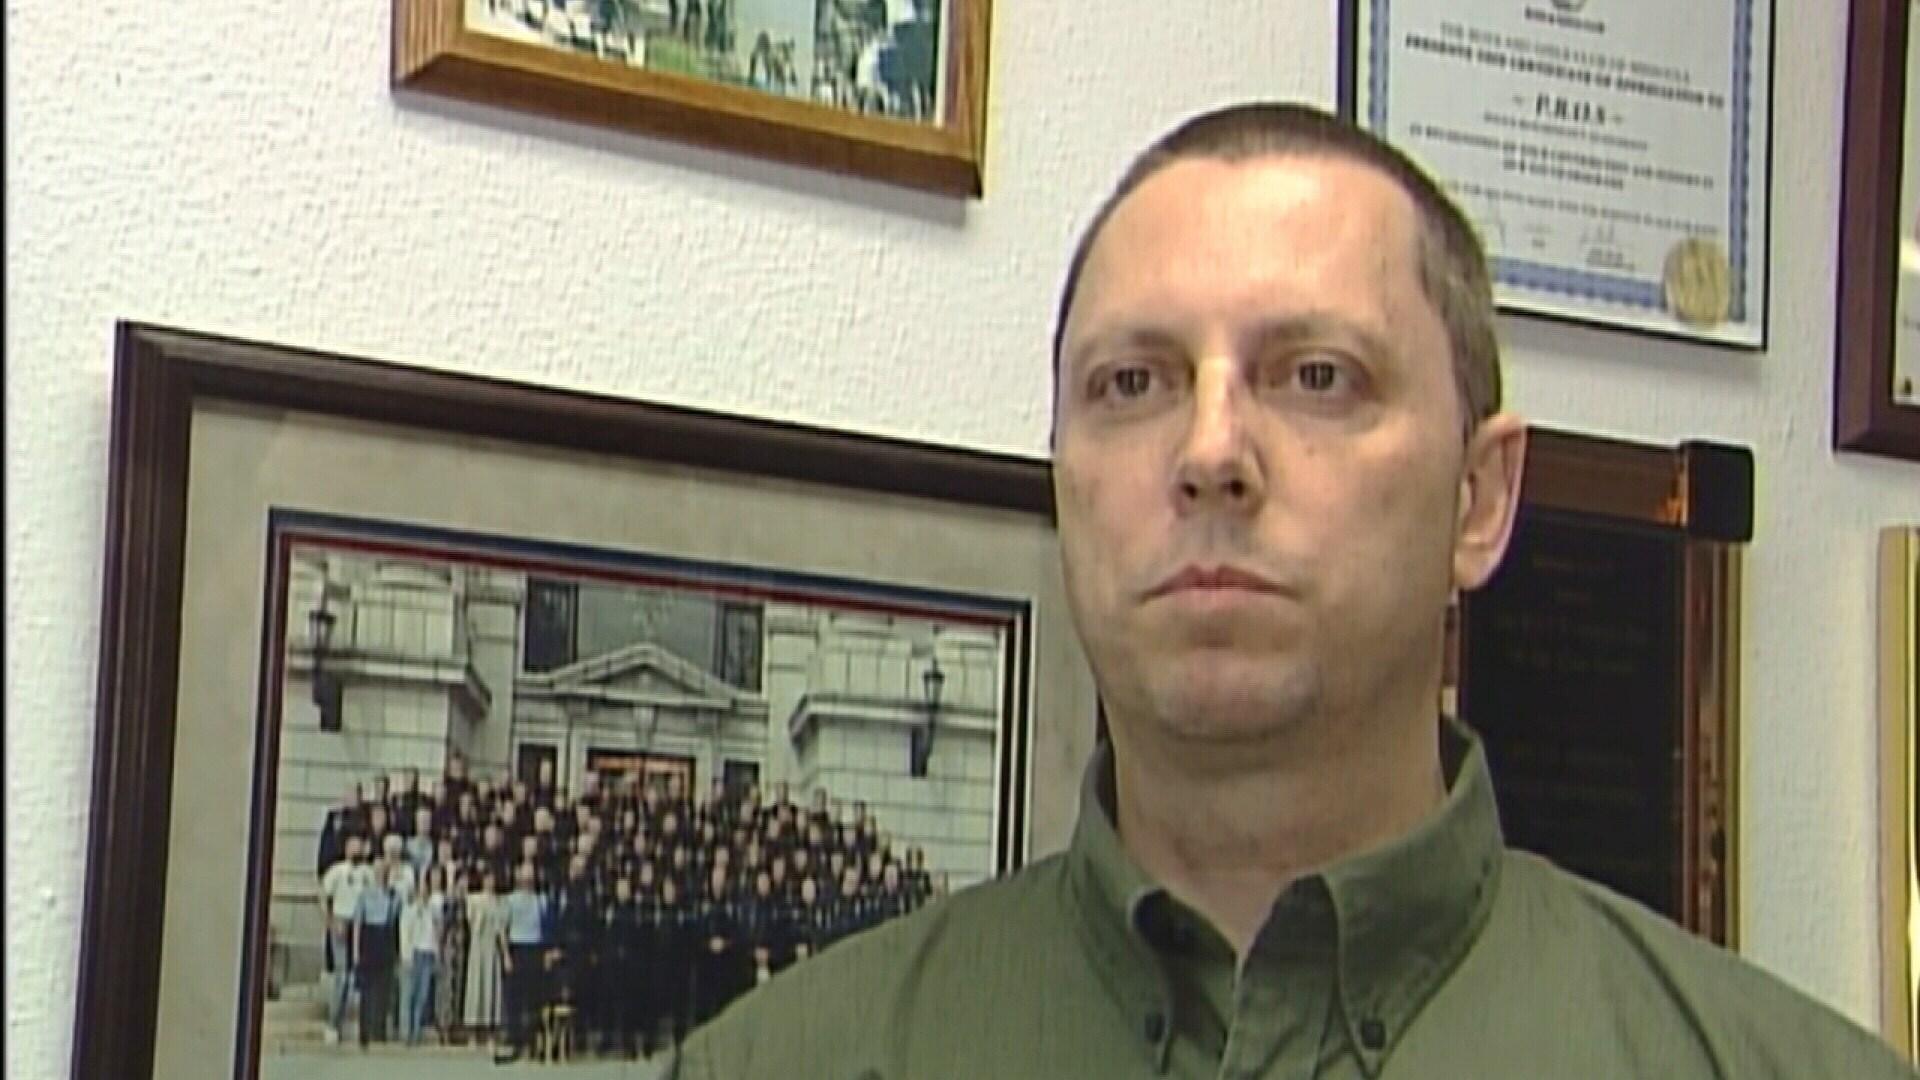 Steve Brester worked for the Missoula PD until 2012 (MTN News)